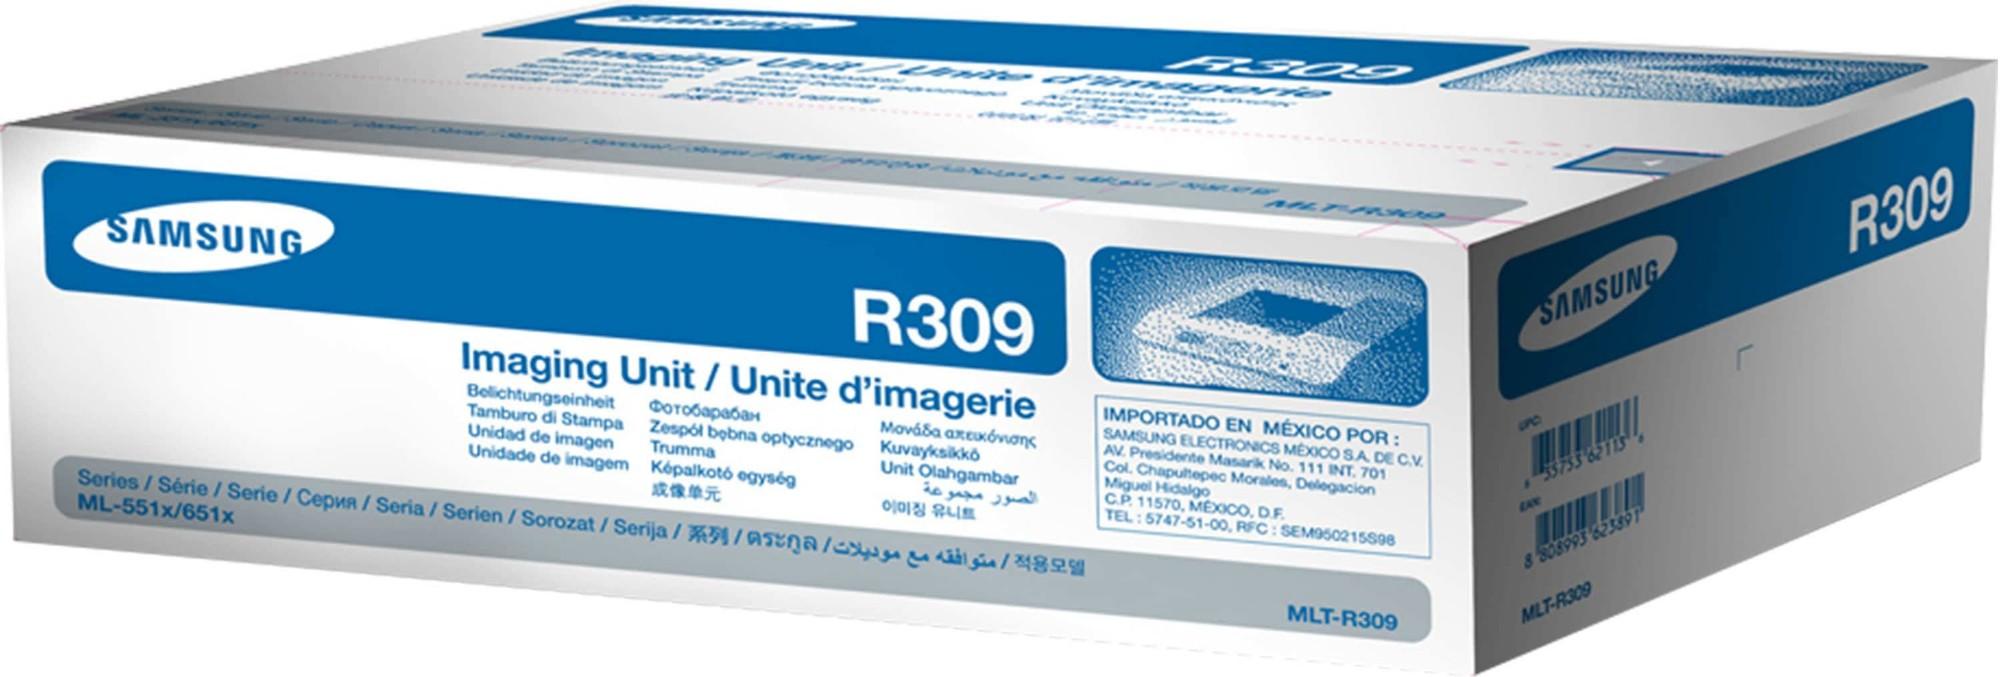 Samsung MLT-R309 fotoconductor 80000 páginas